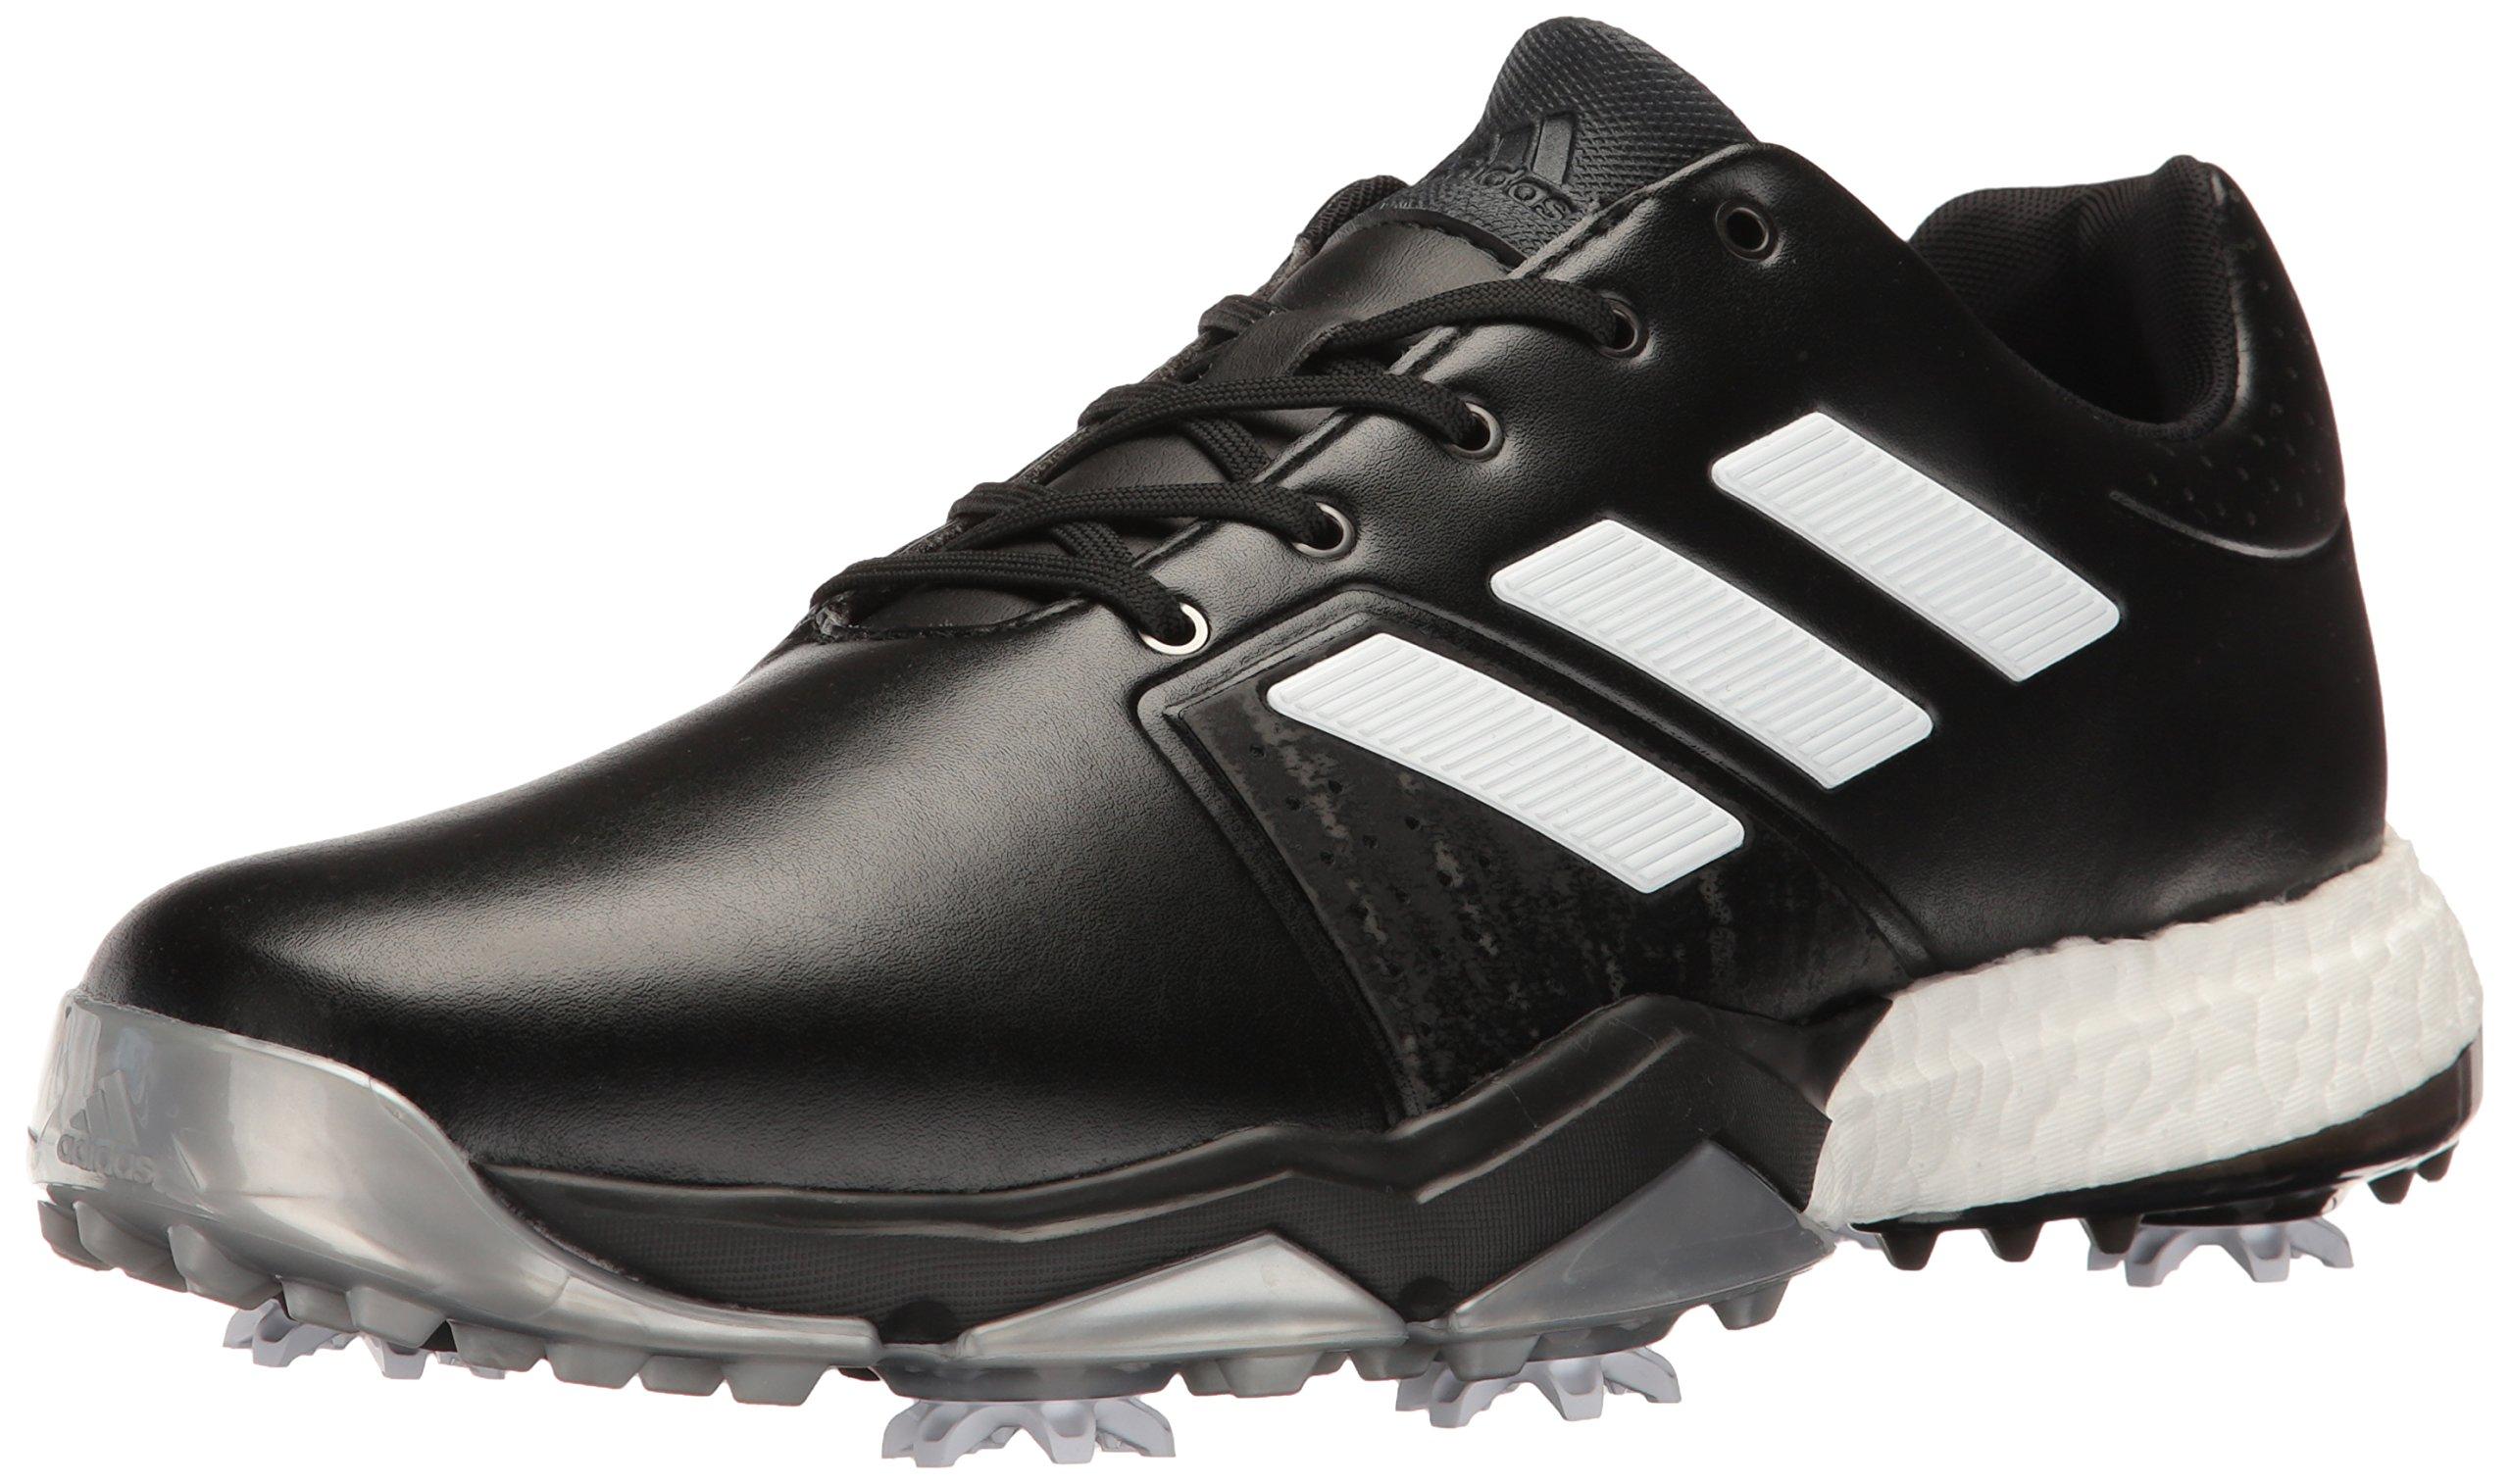 adidas Men's Adipower Boost 3 Golf Shoe, Black/White/Silver Metallic, 7.5 M US